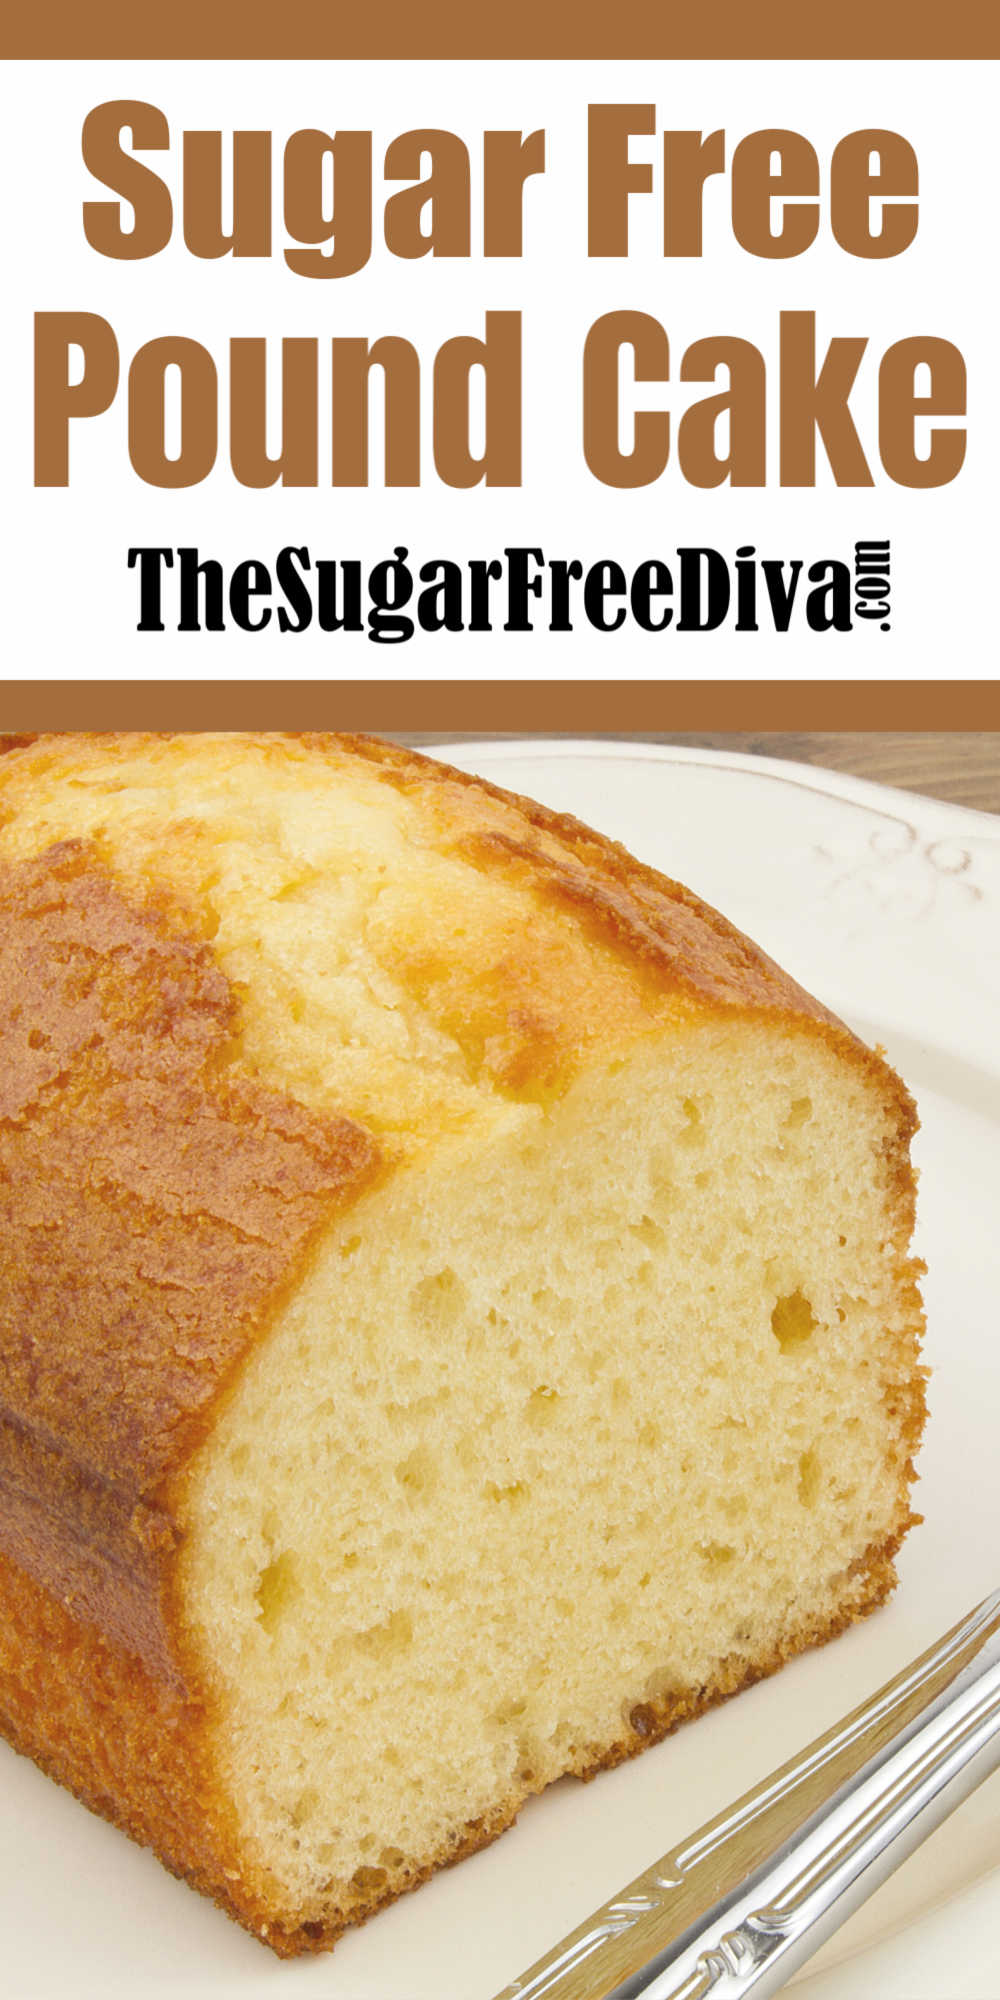 How to Make Sugar Free Pound Cake